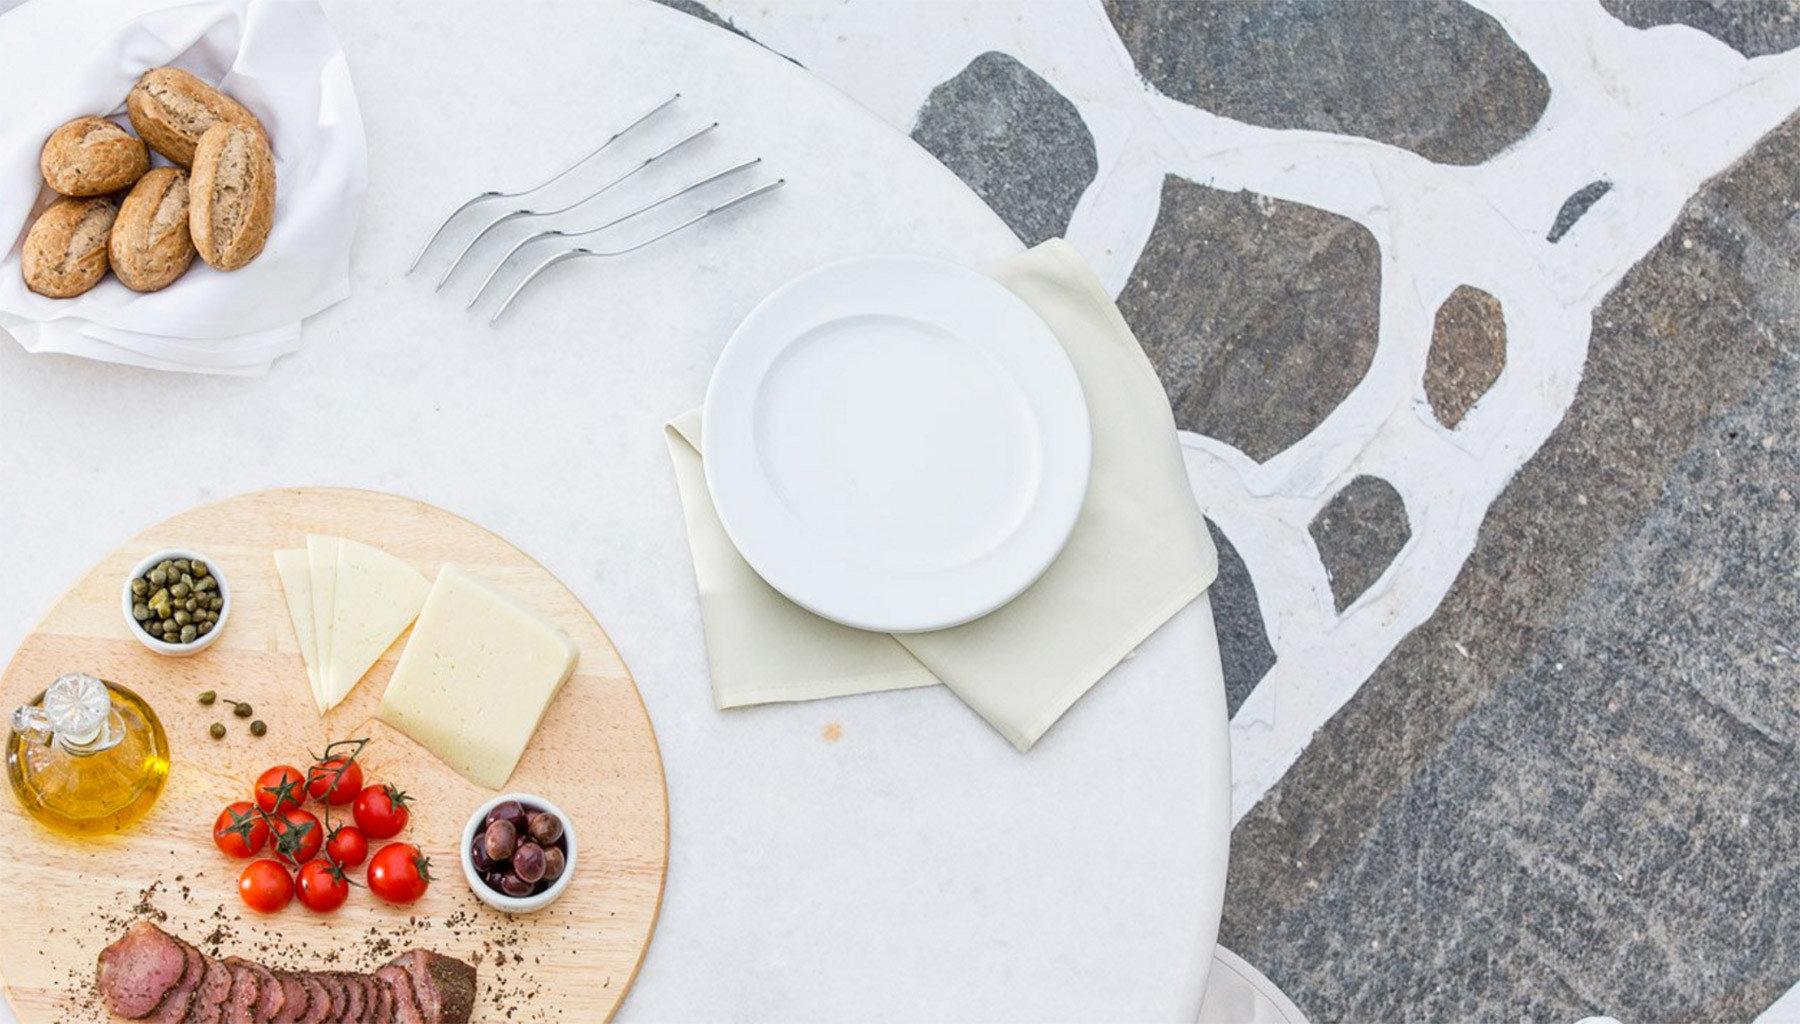 food tablecloth material baking